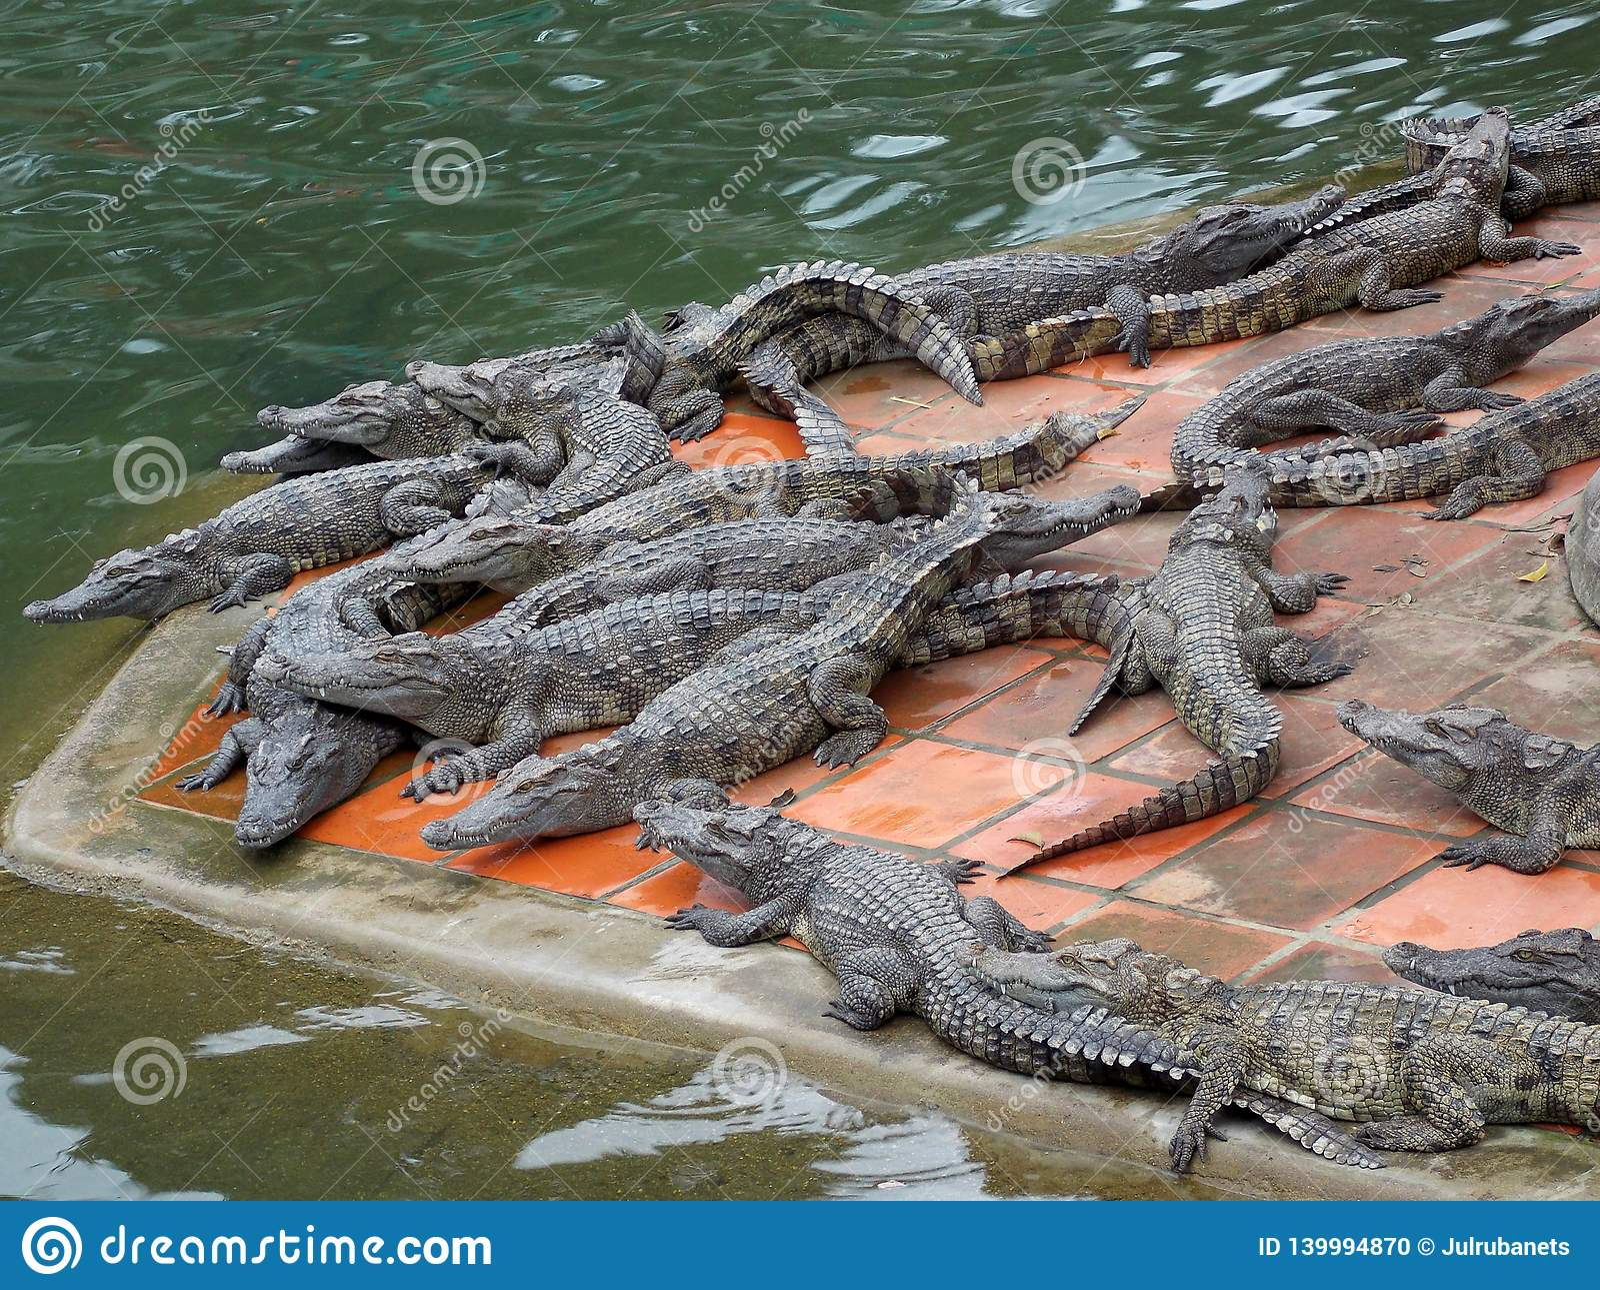 Crocodile farm, Vietnam